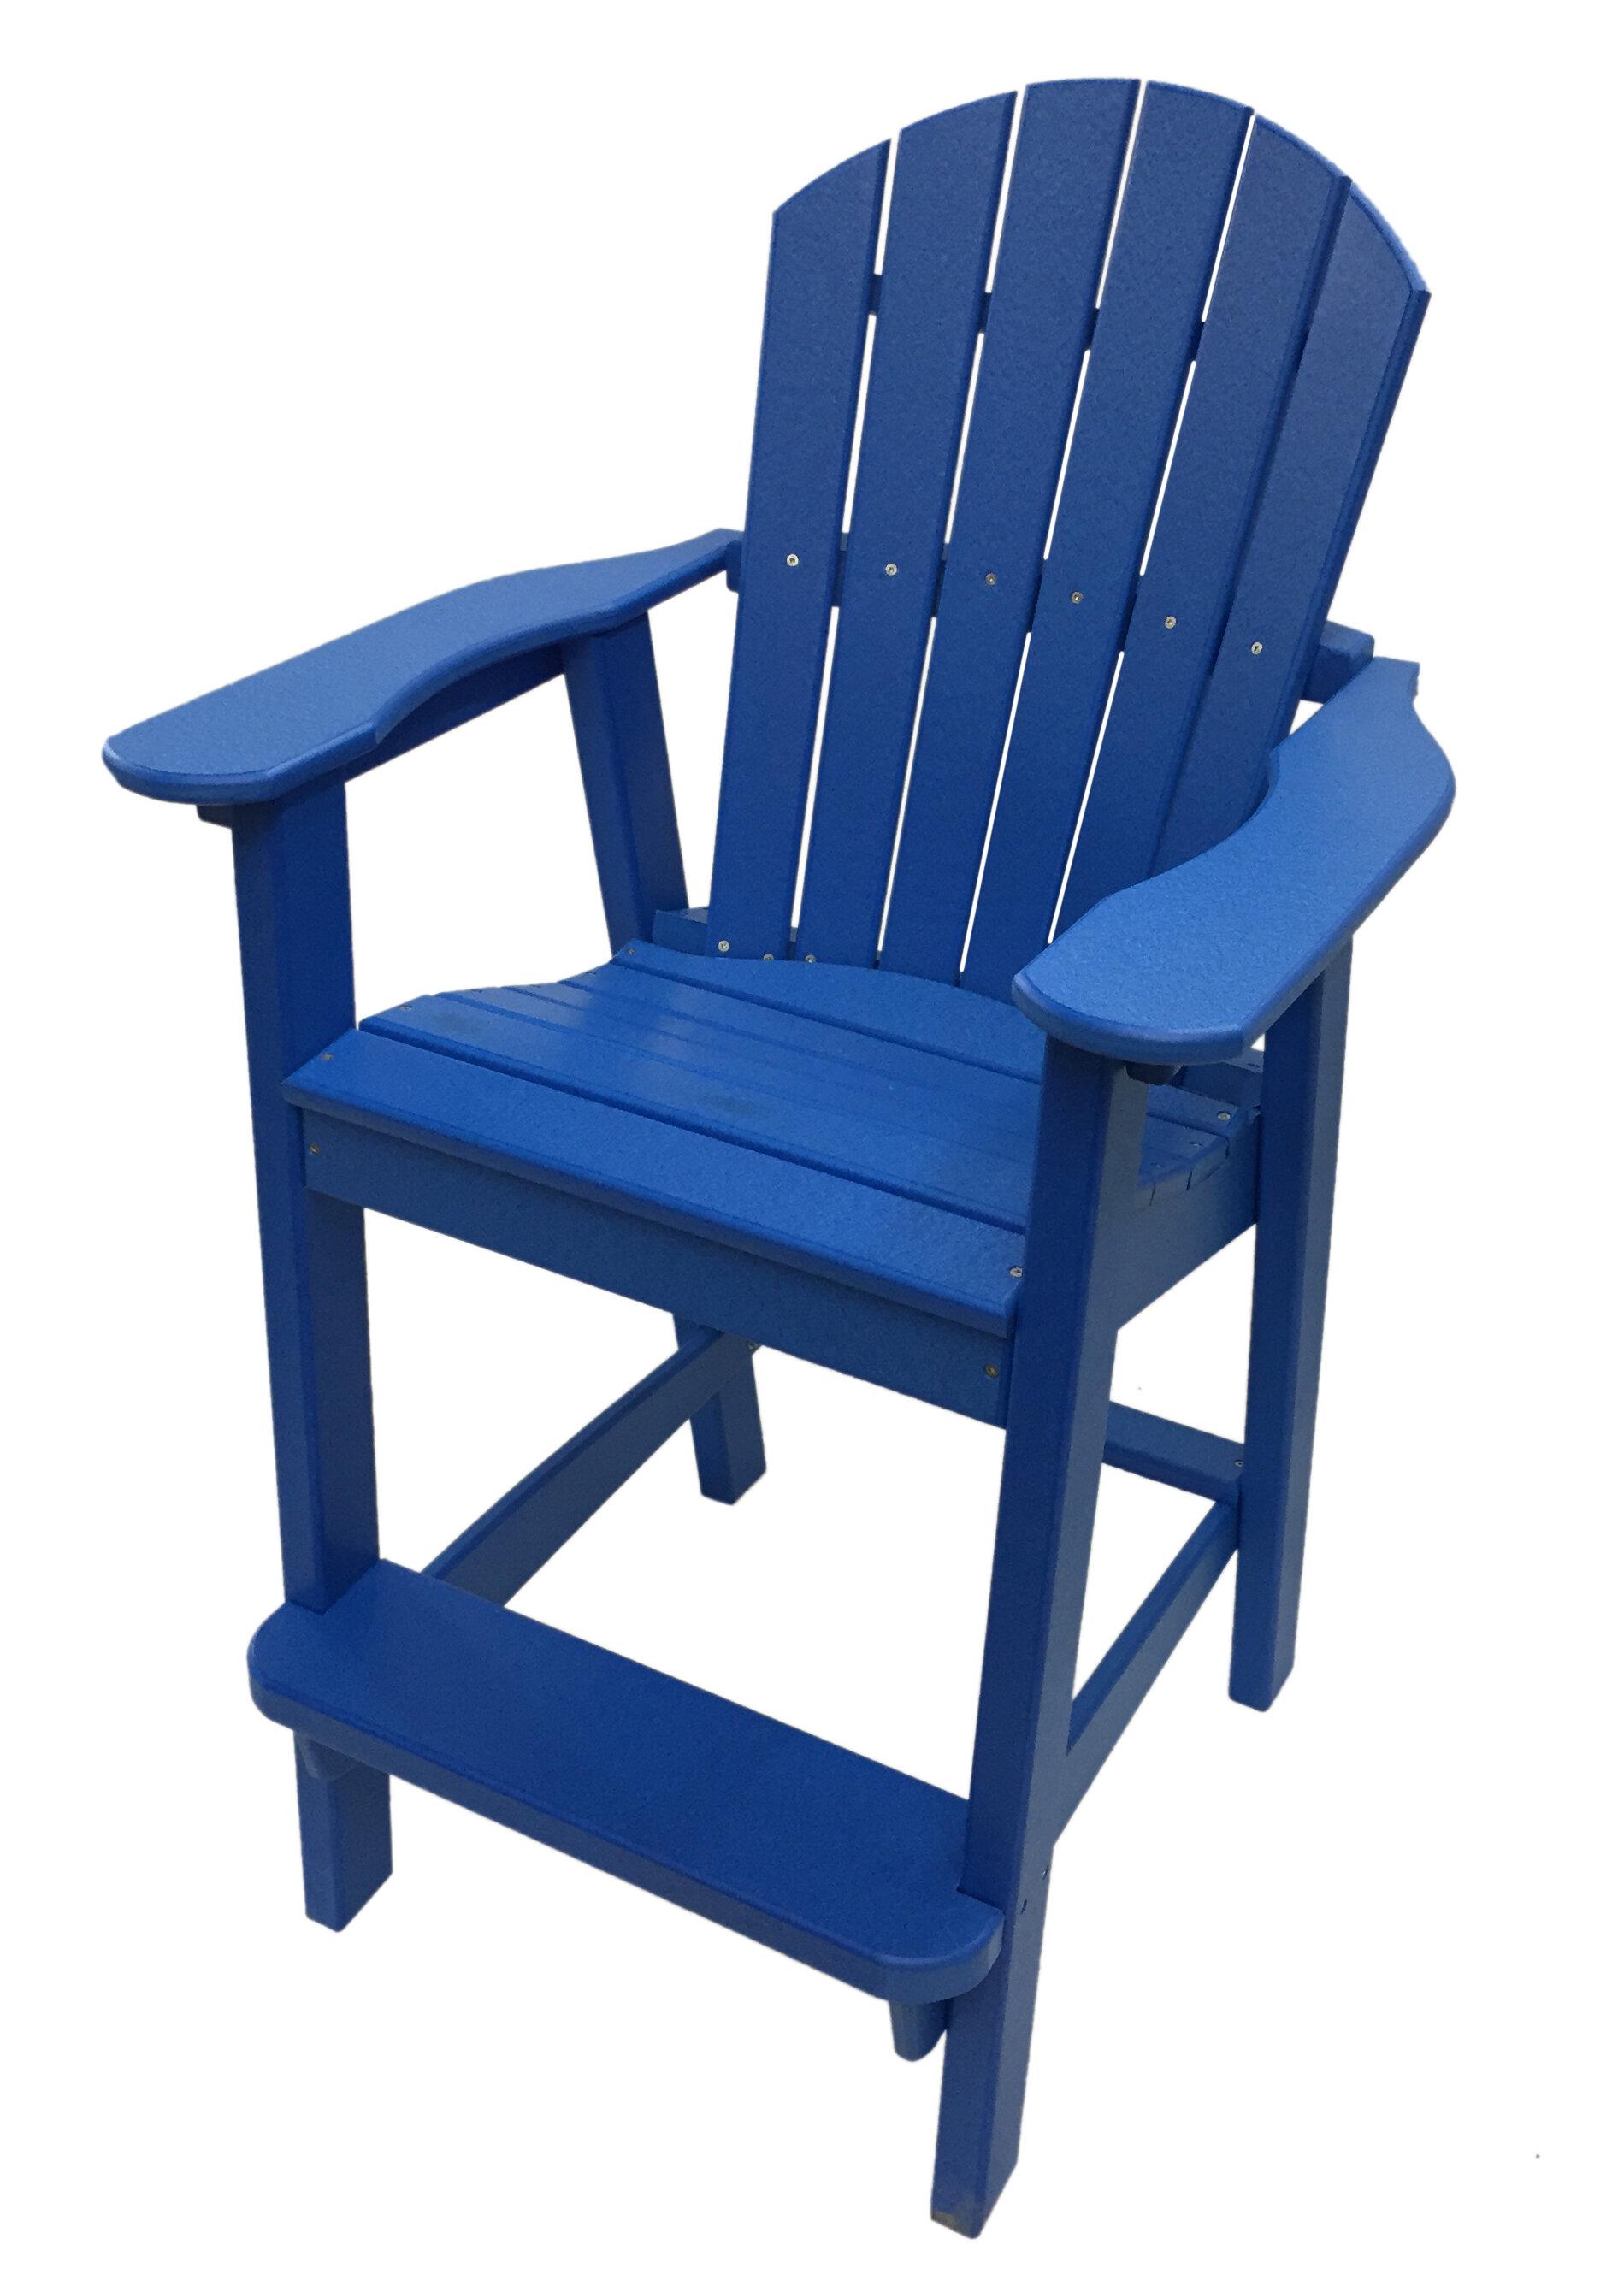 Ers Choice Phat Tommy Balcony Plastic Adirondack Chair Reviews Wayfair